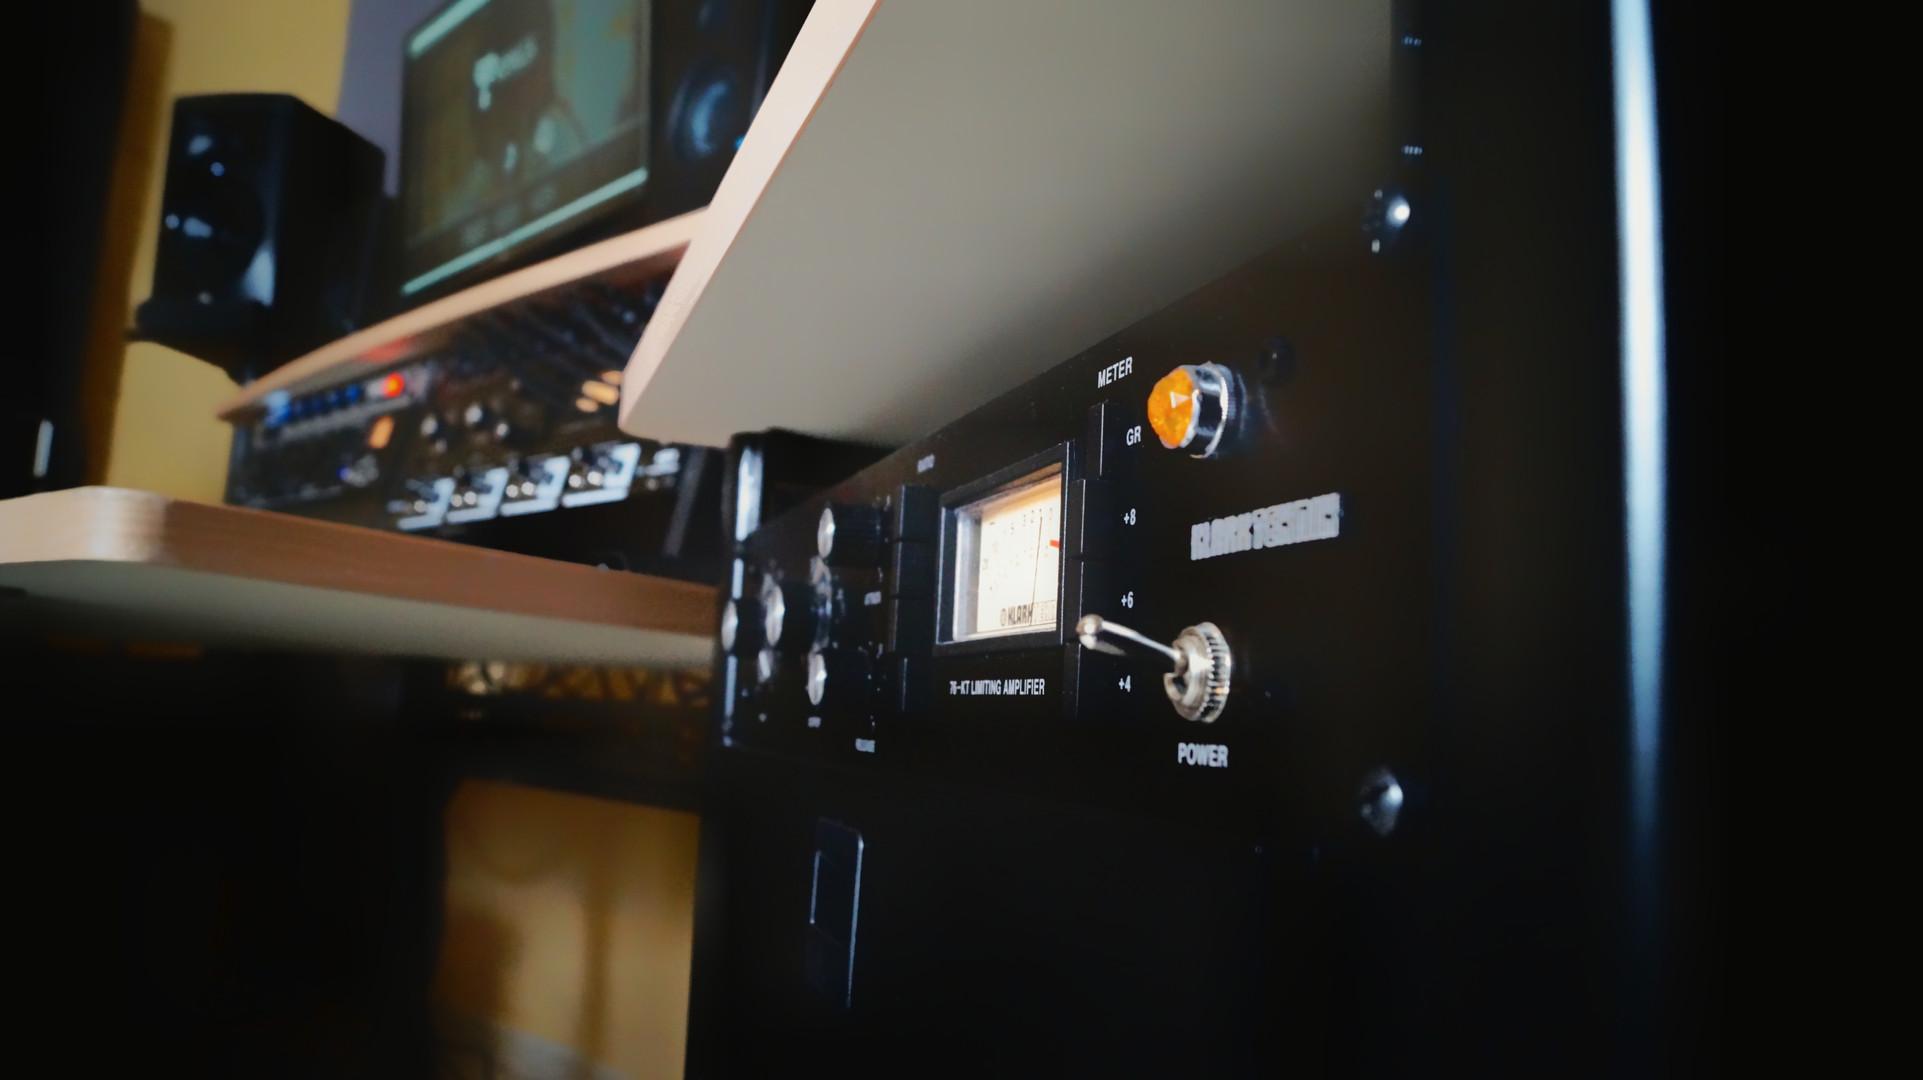 Klark Teknik KT-76 Kompressor